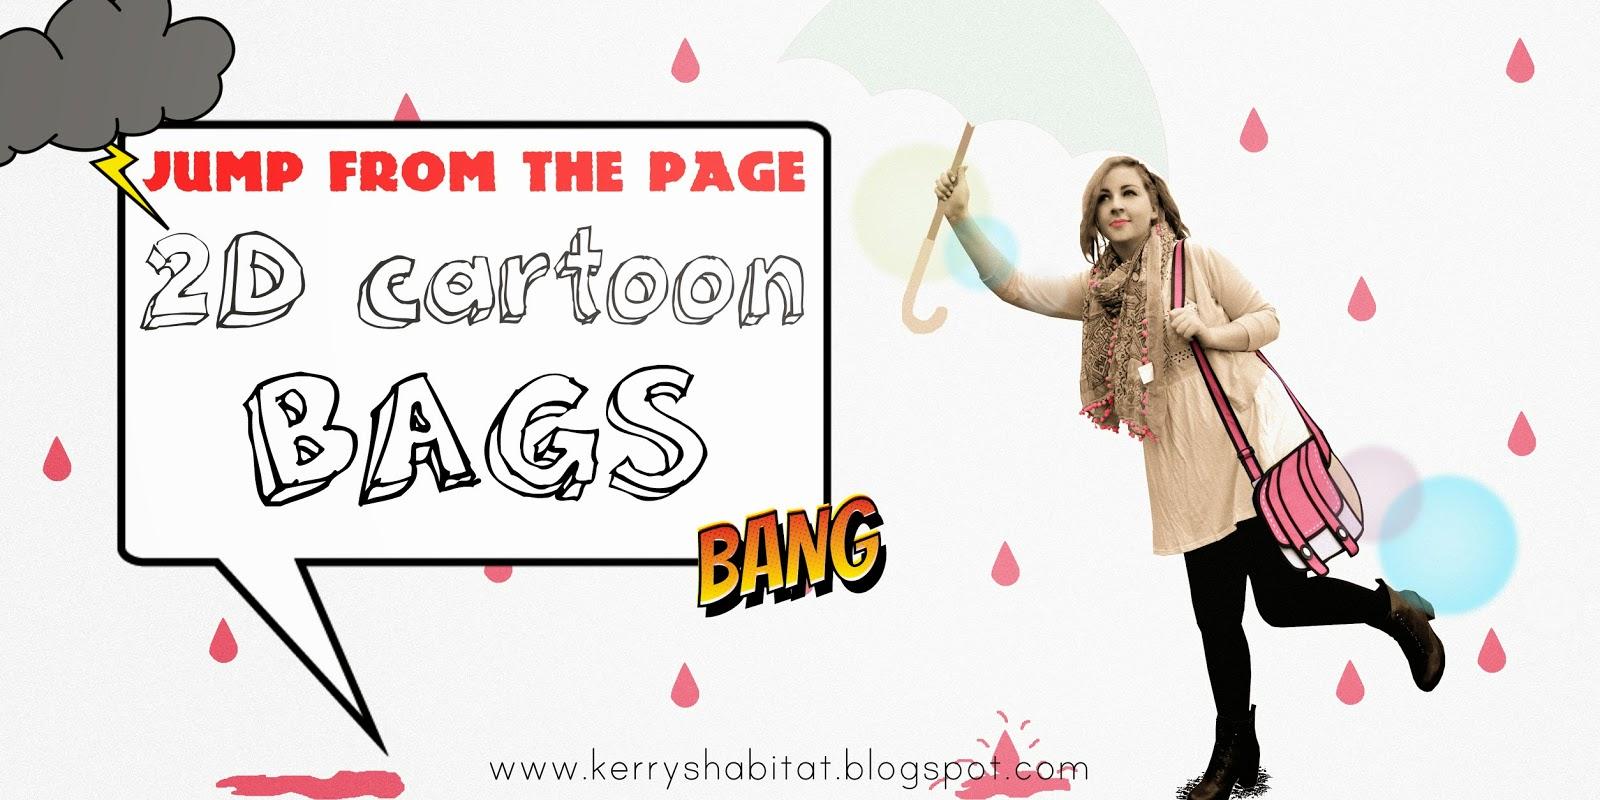 http://kerryshabitat.blogspot.co.uk/2014/06/jump-from-page-2d-bags.html